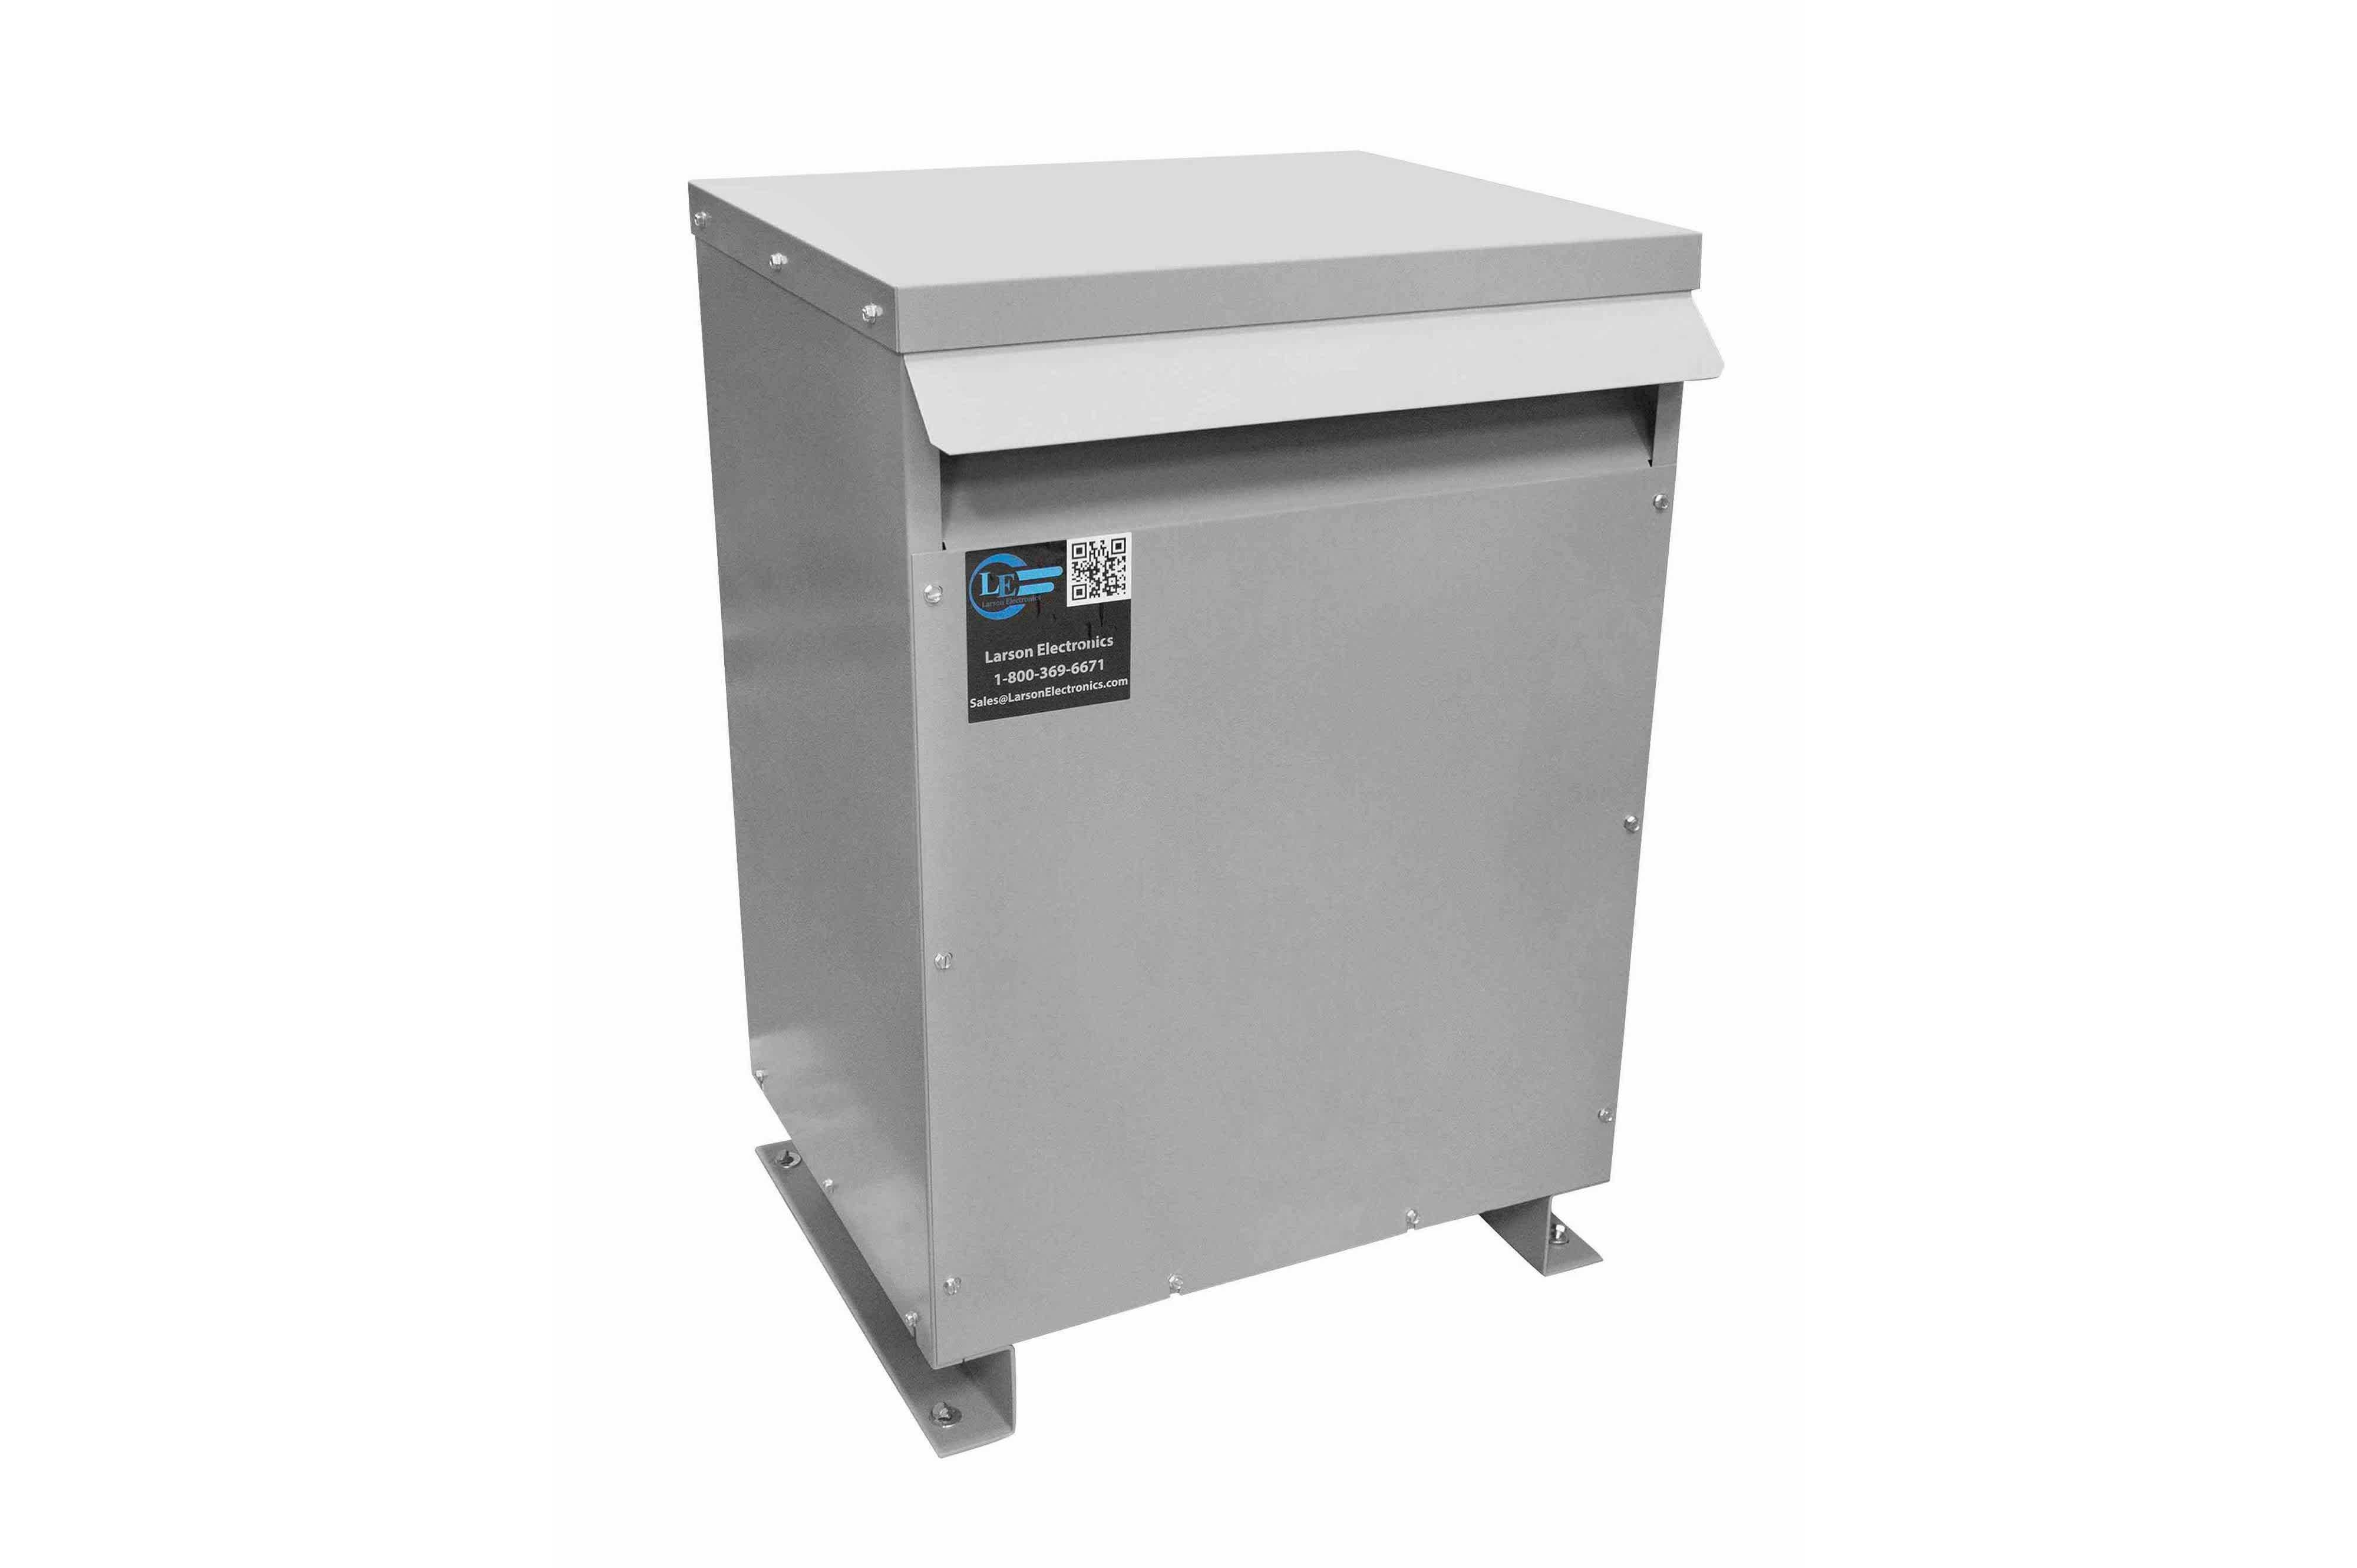 225 kVA 3PH Isolation Transformer, 380V Wye Primary, 480V Delta Secondary, N3R, Ventilated, 60 Hz